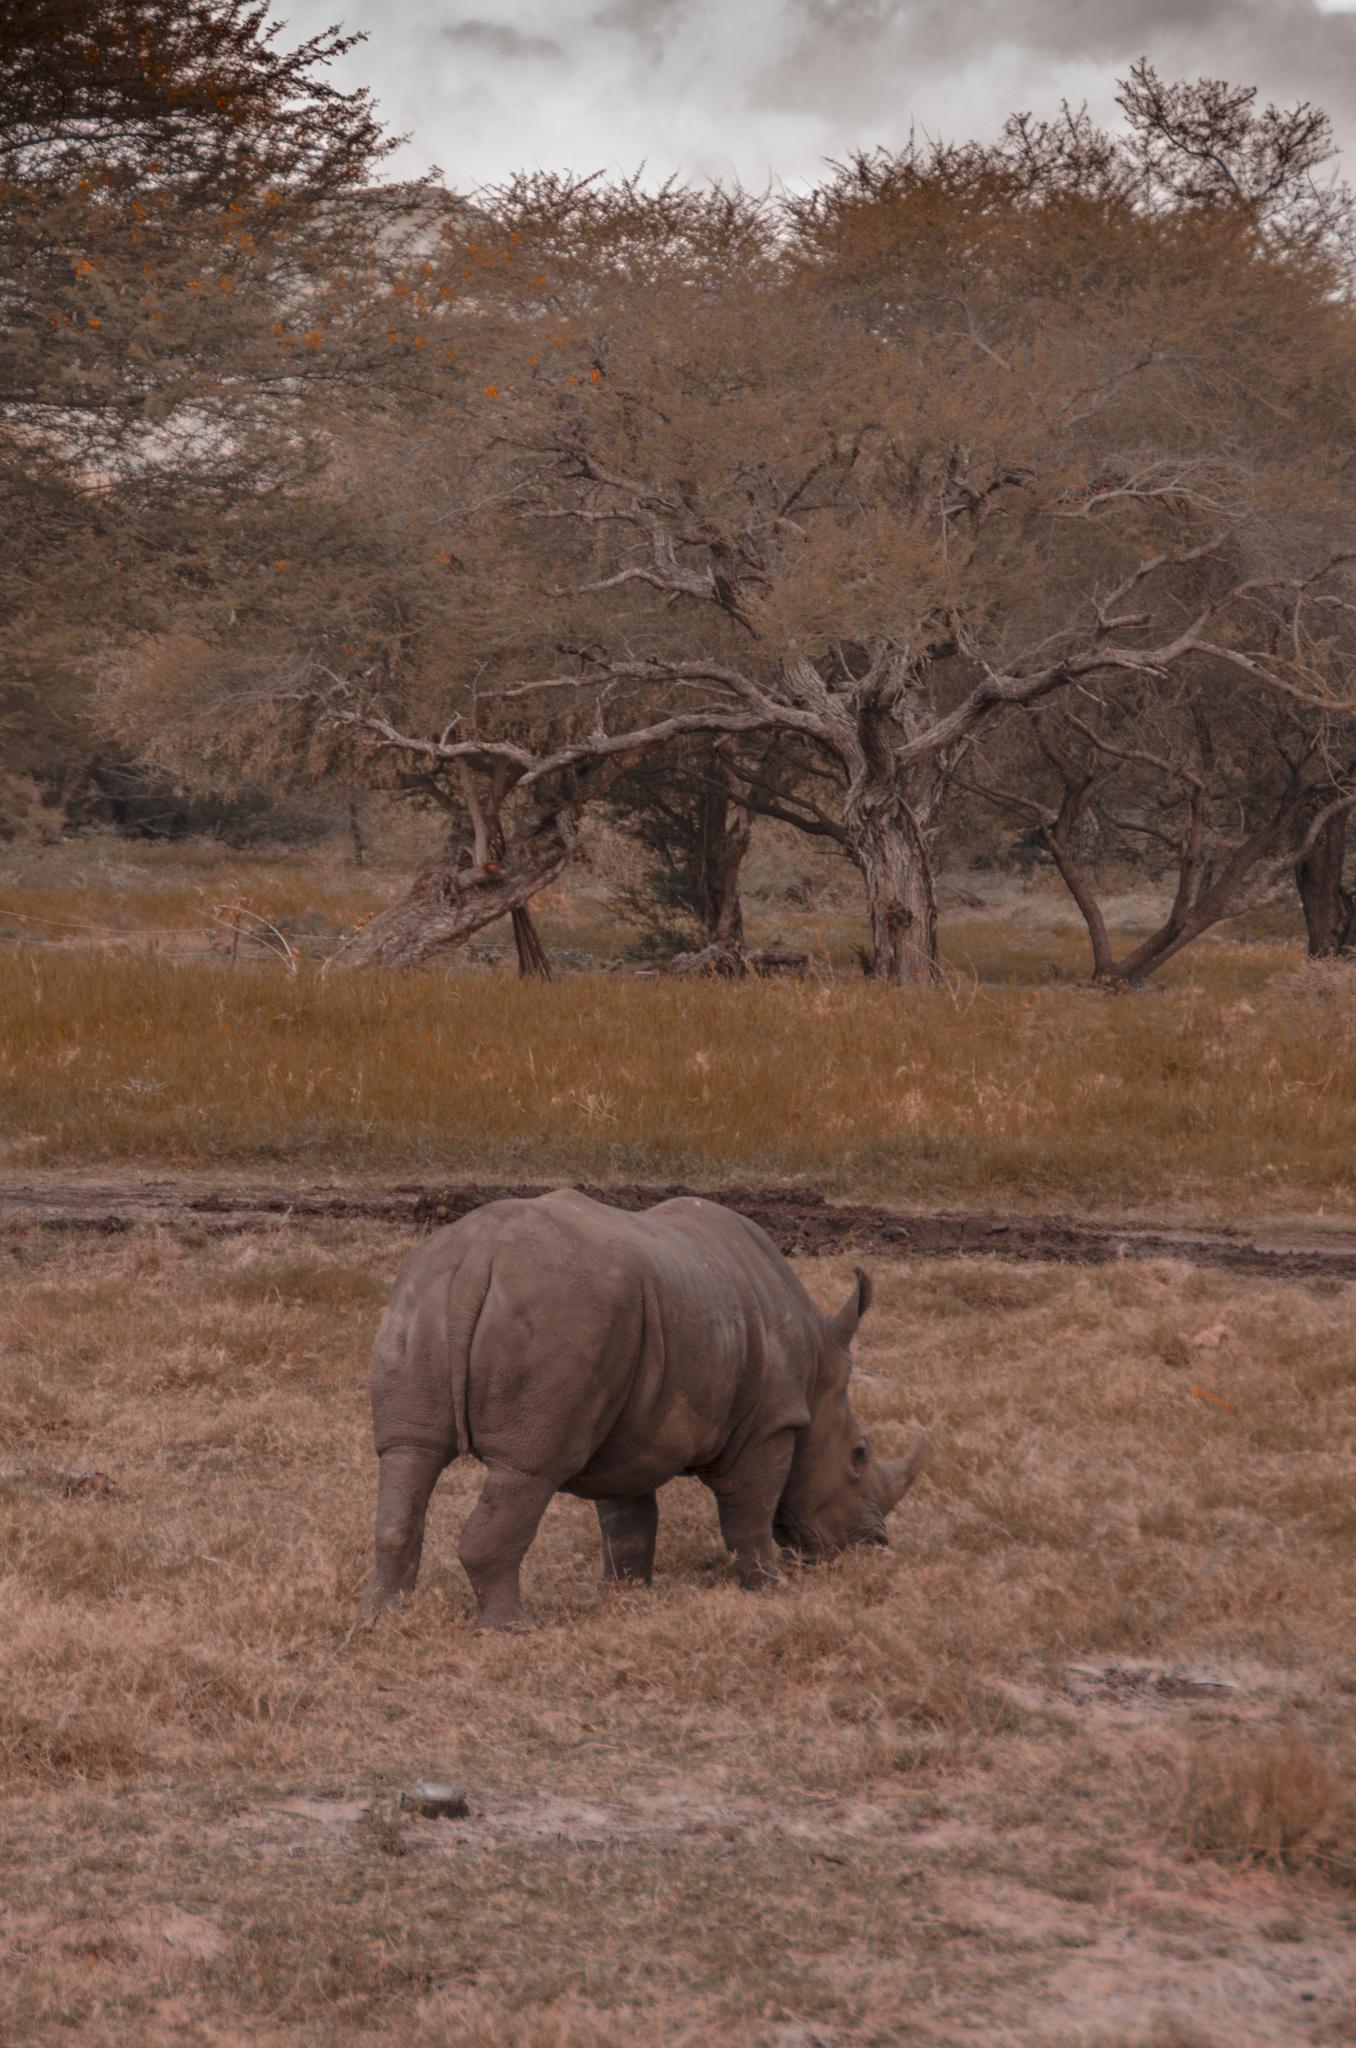 Rhino by andinegerard